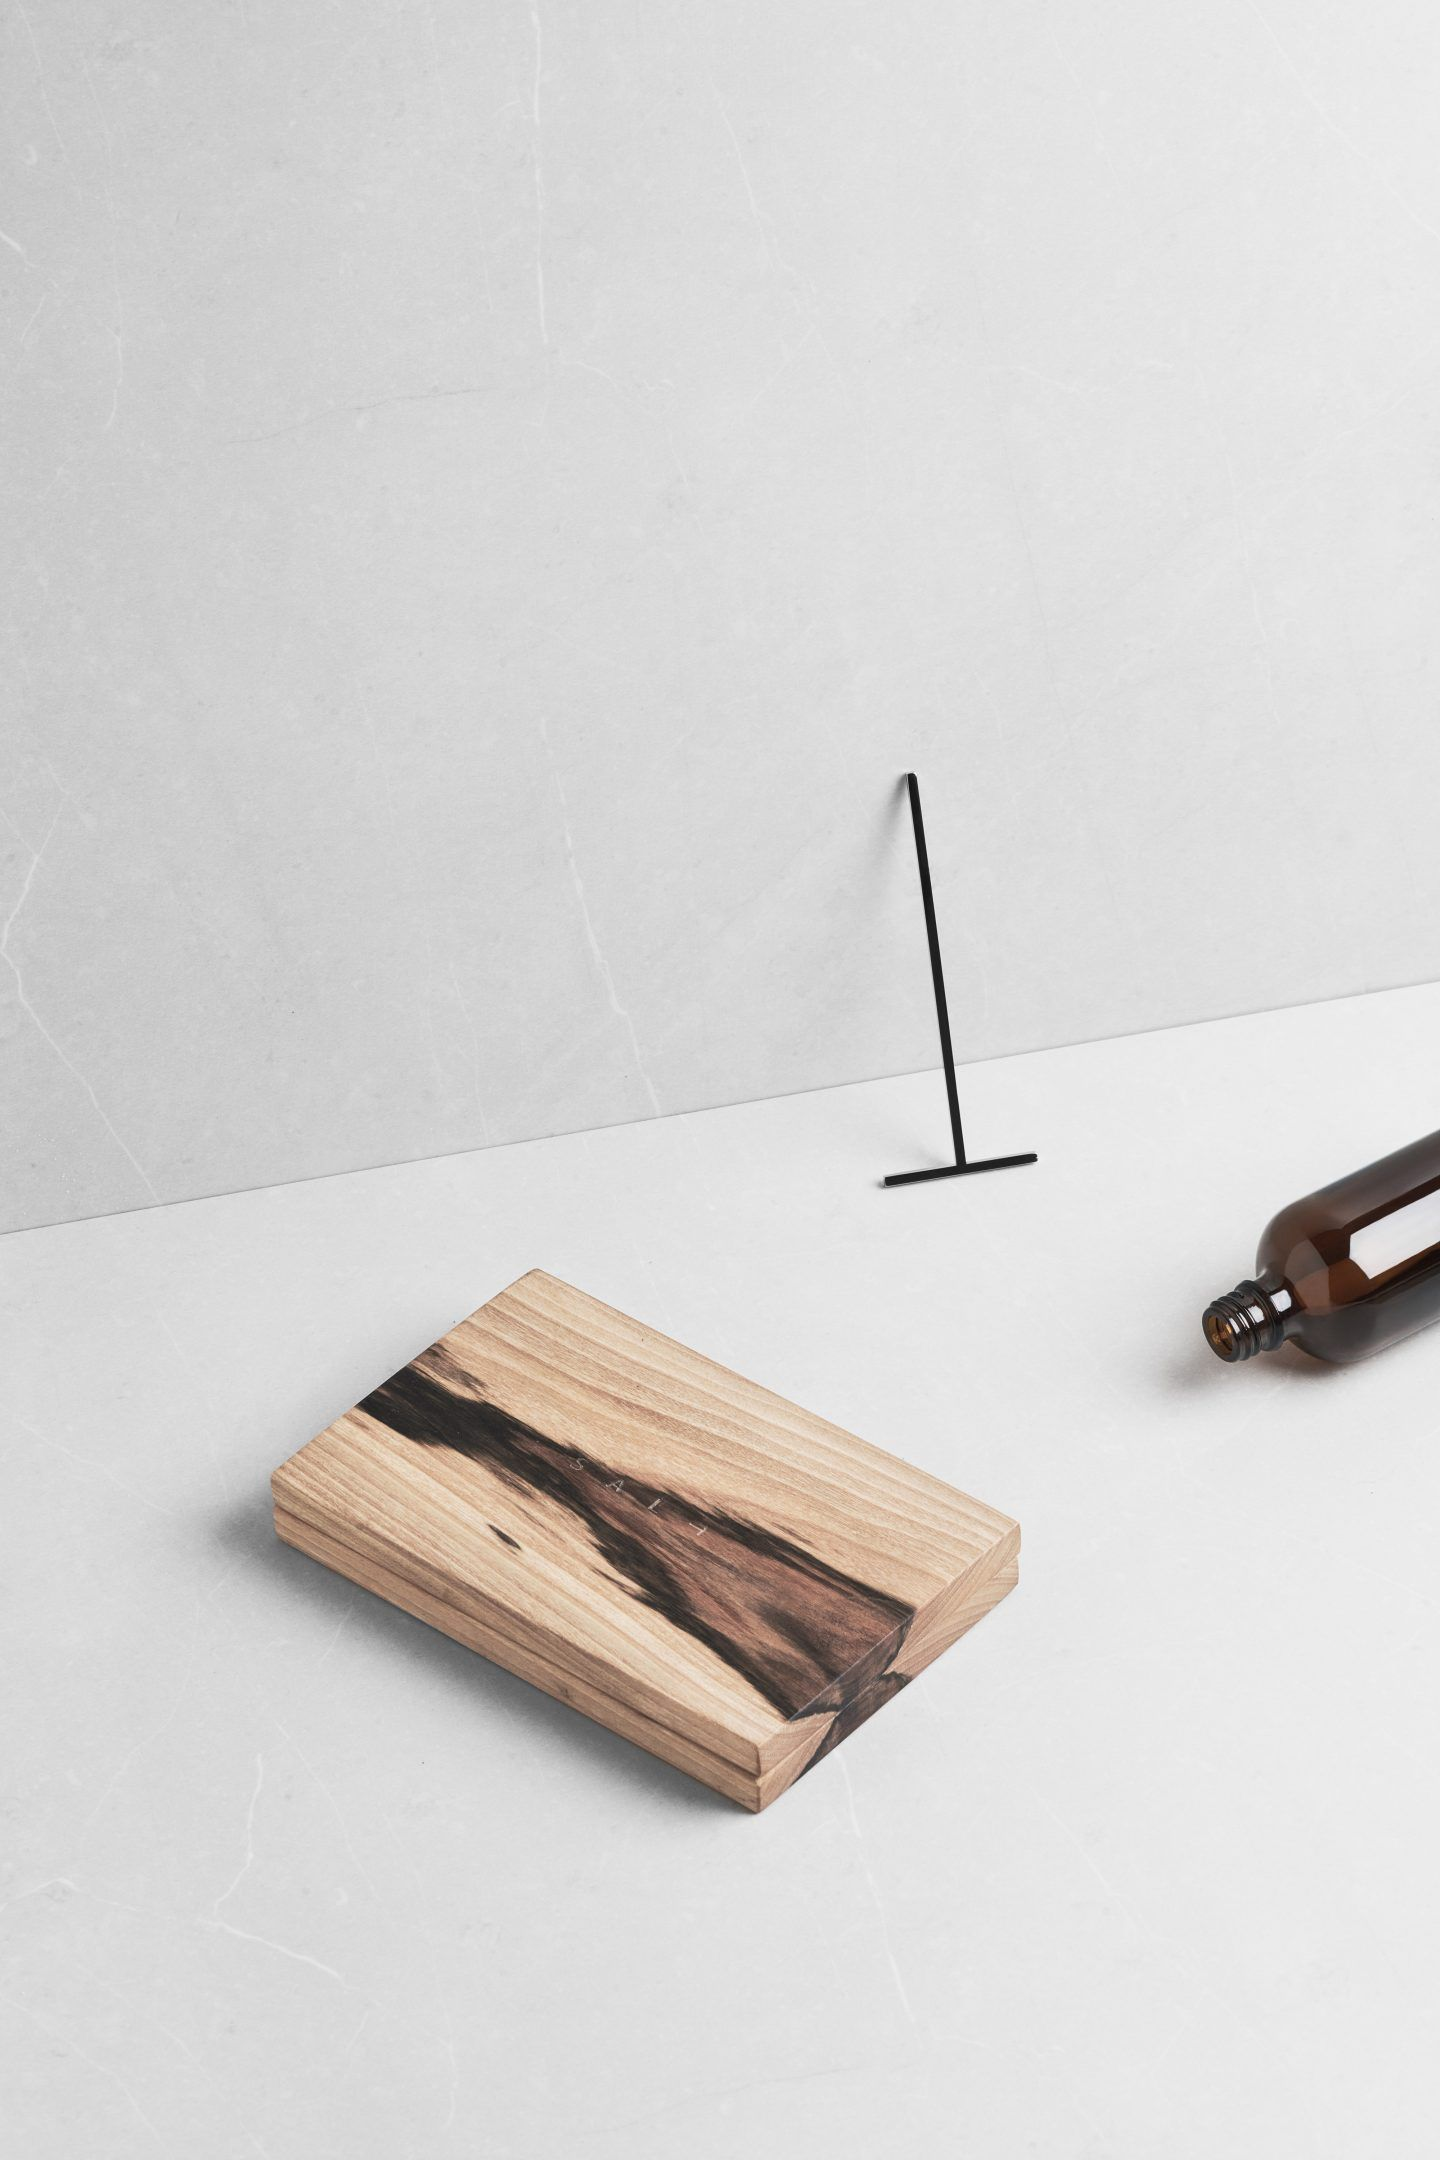 IGNANT-Design-BOIR-4